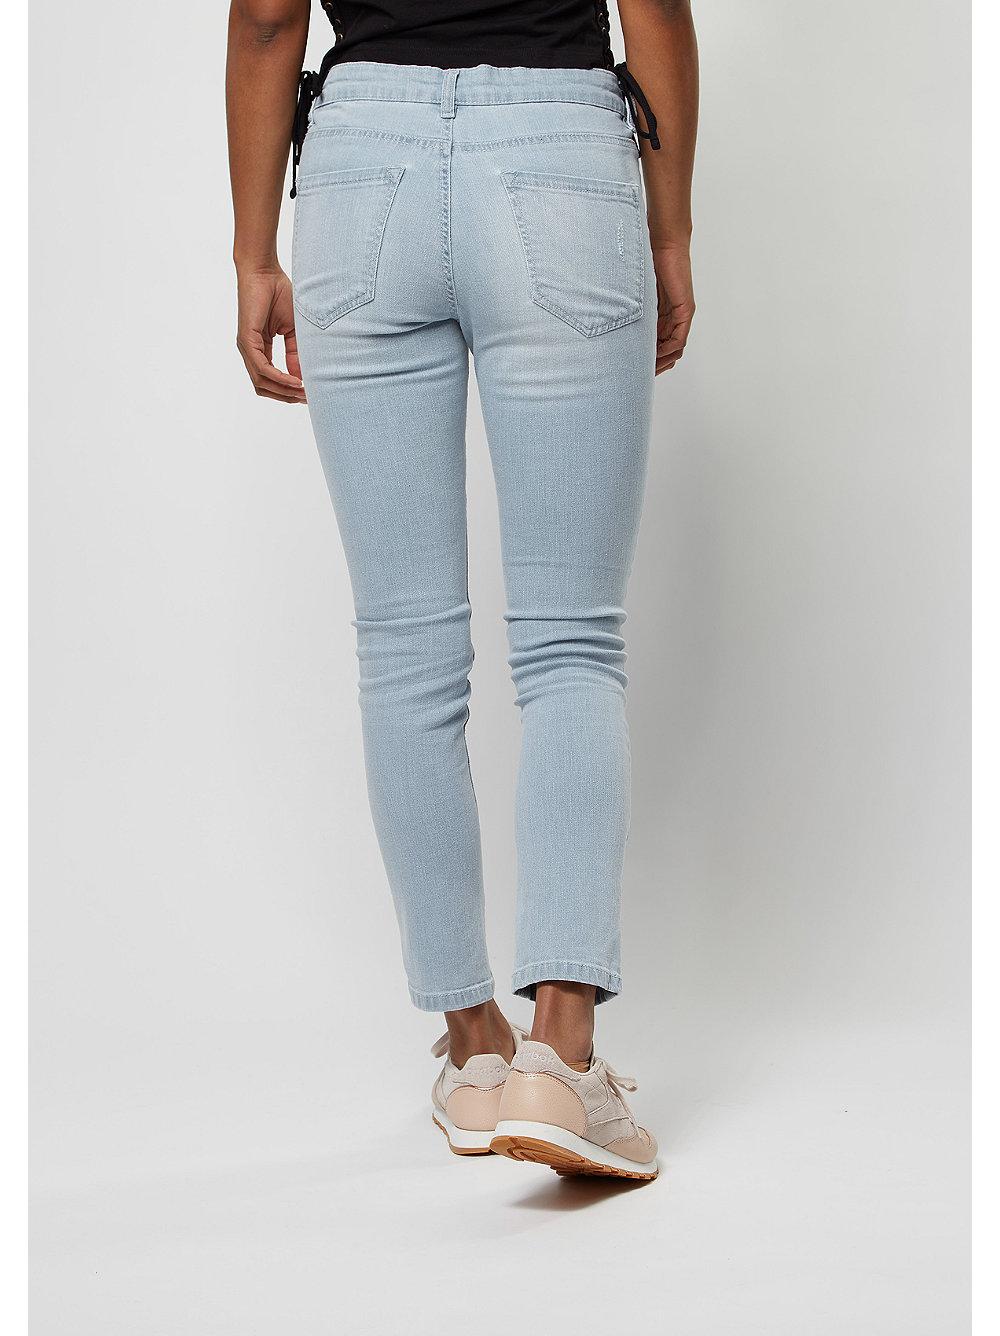 urban classics jeans hose high waist skinny. Black Bedroom Furniture Sets. Home Design Ideas